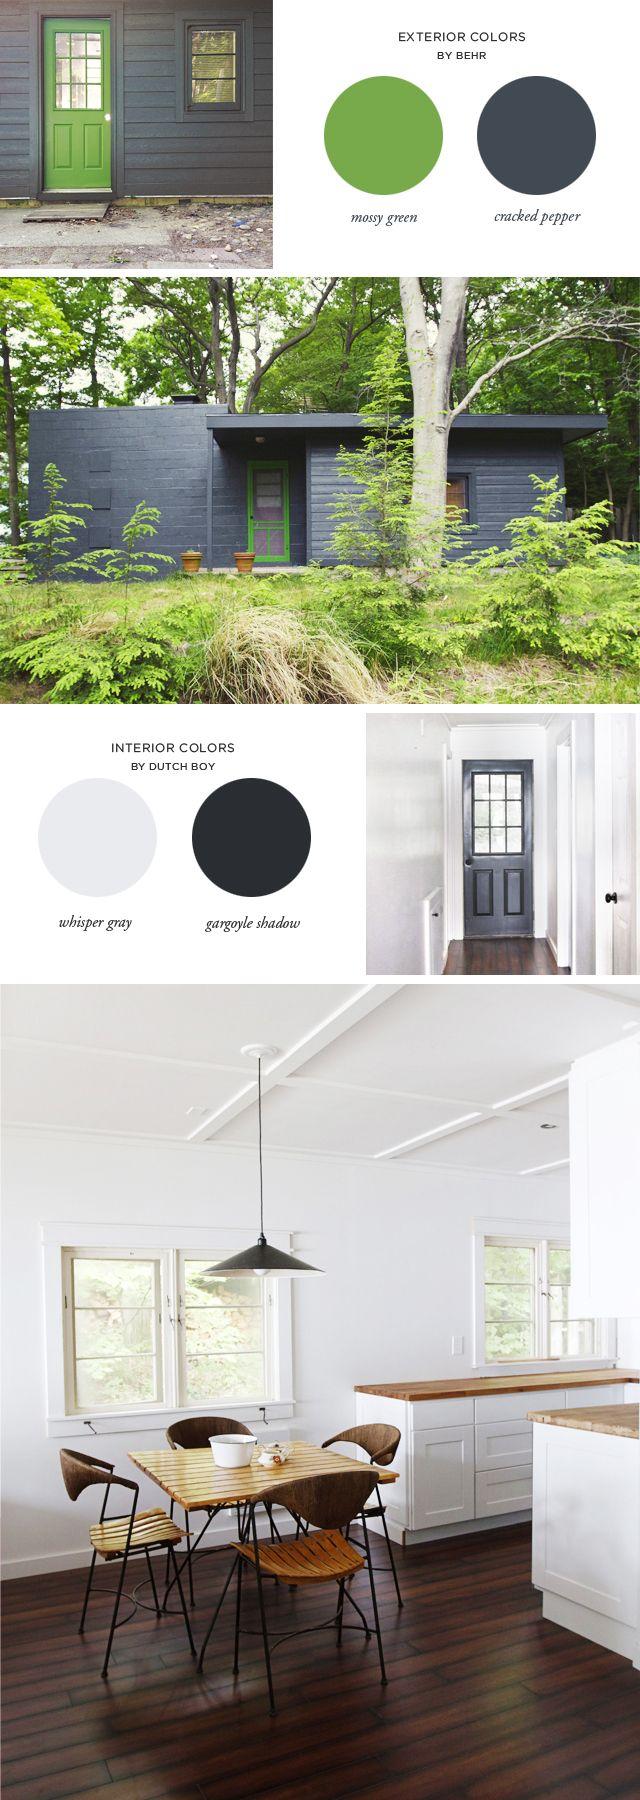 The 25 Best Behr Exterior Paint Colors Ideas On Pinterest Gray Paint Colors Grey Interior